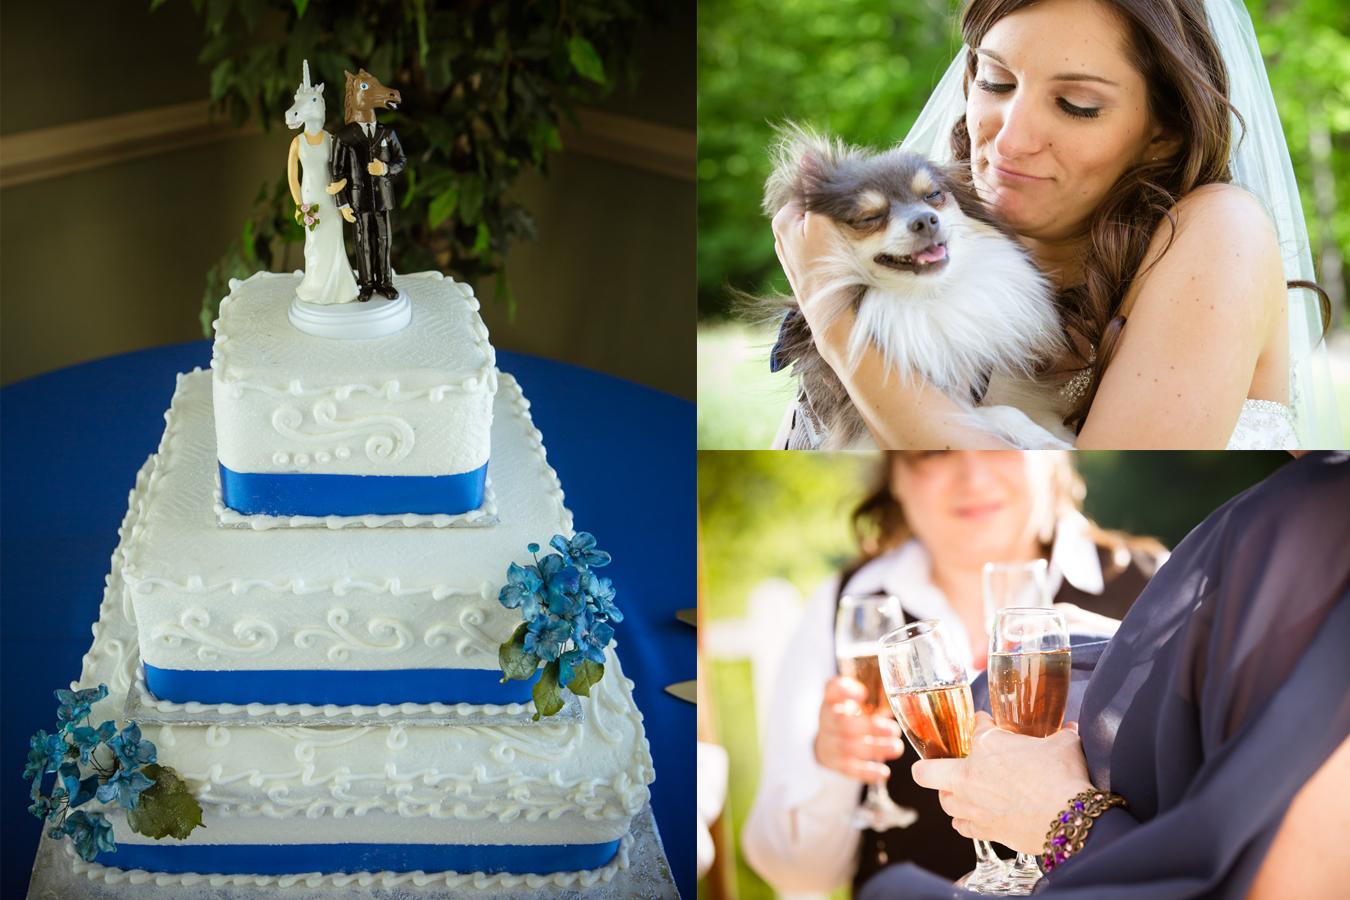 NEPA_Pocono_Weddings_Rob_Lettieri_Photography_12.jpg